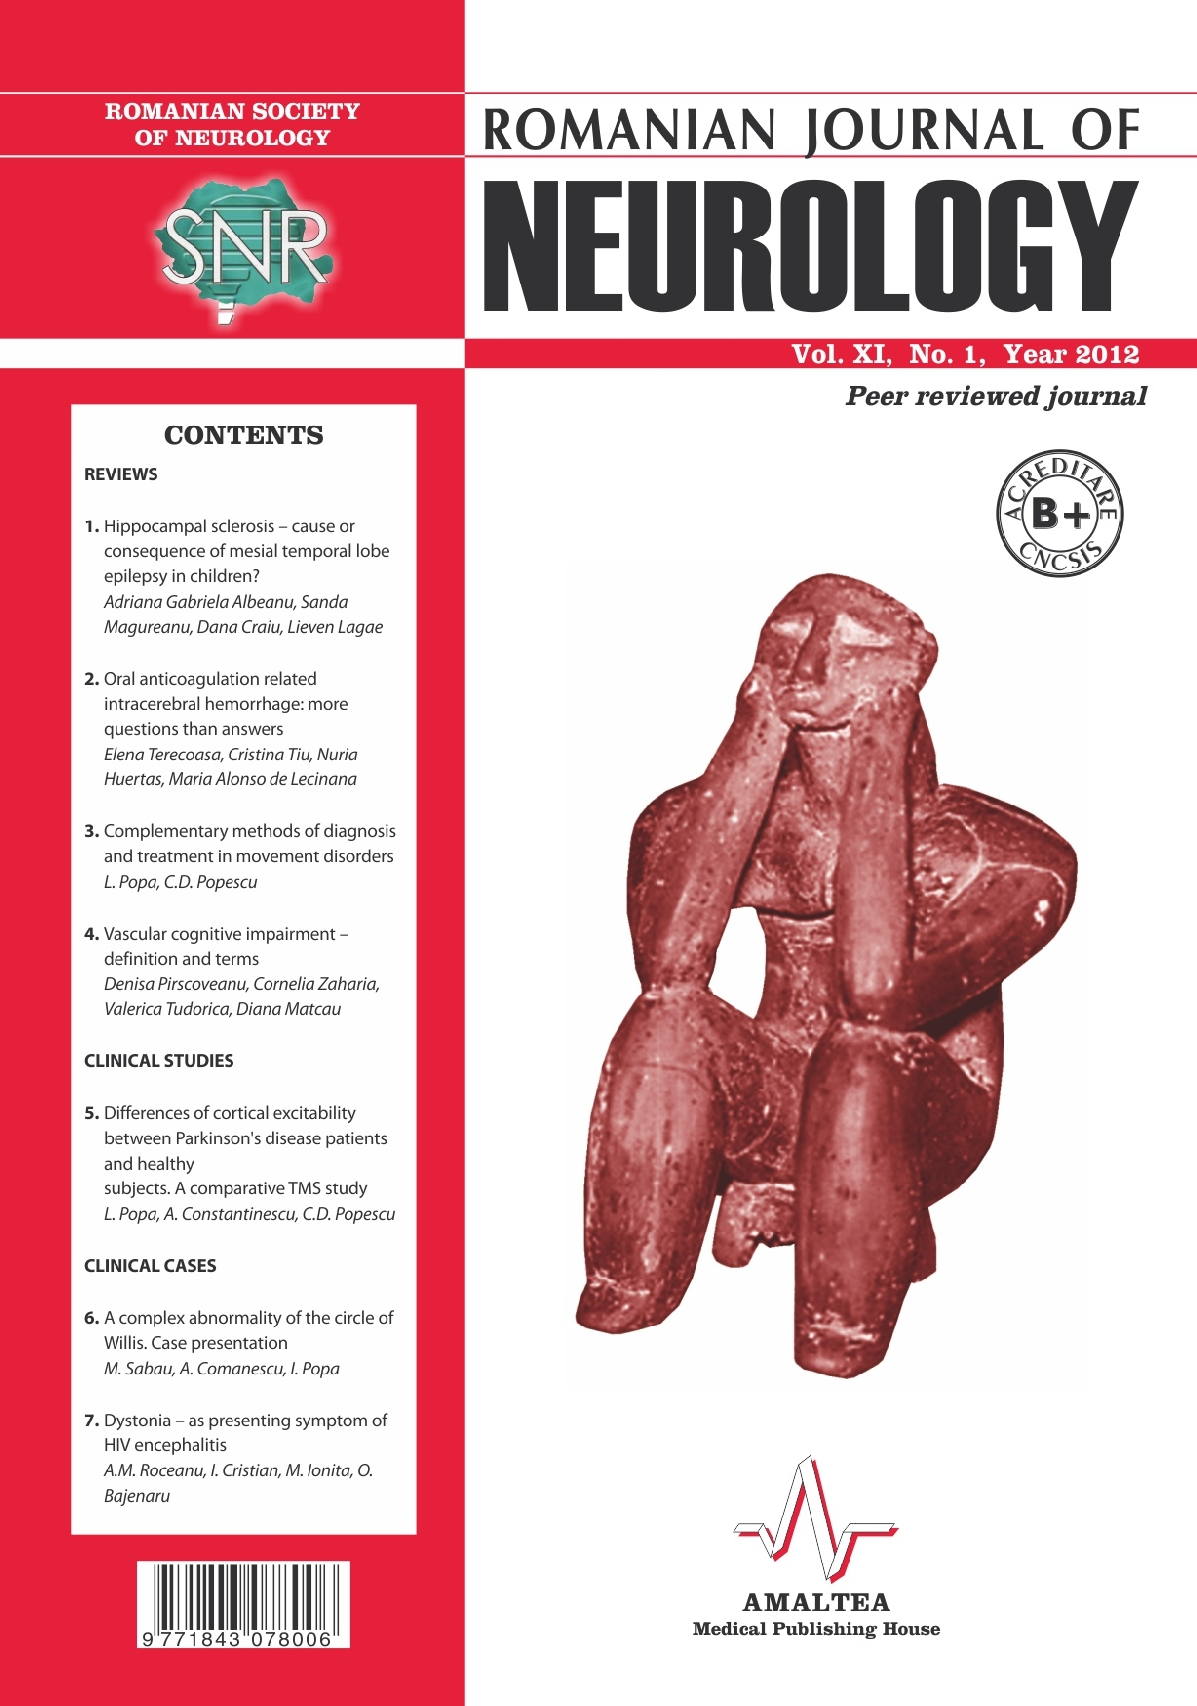 Romanian Journal of Neurology, Volume XI, No. 1, 2012